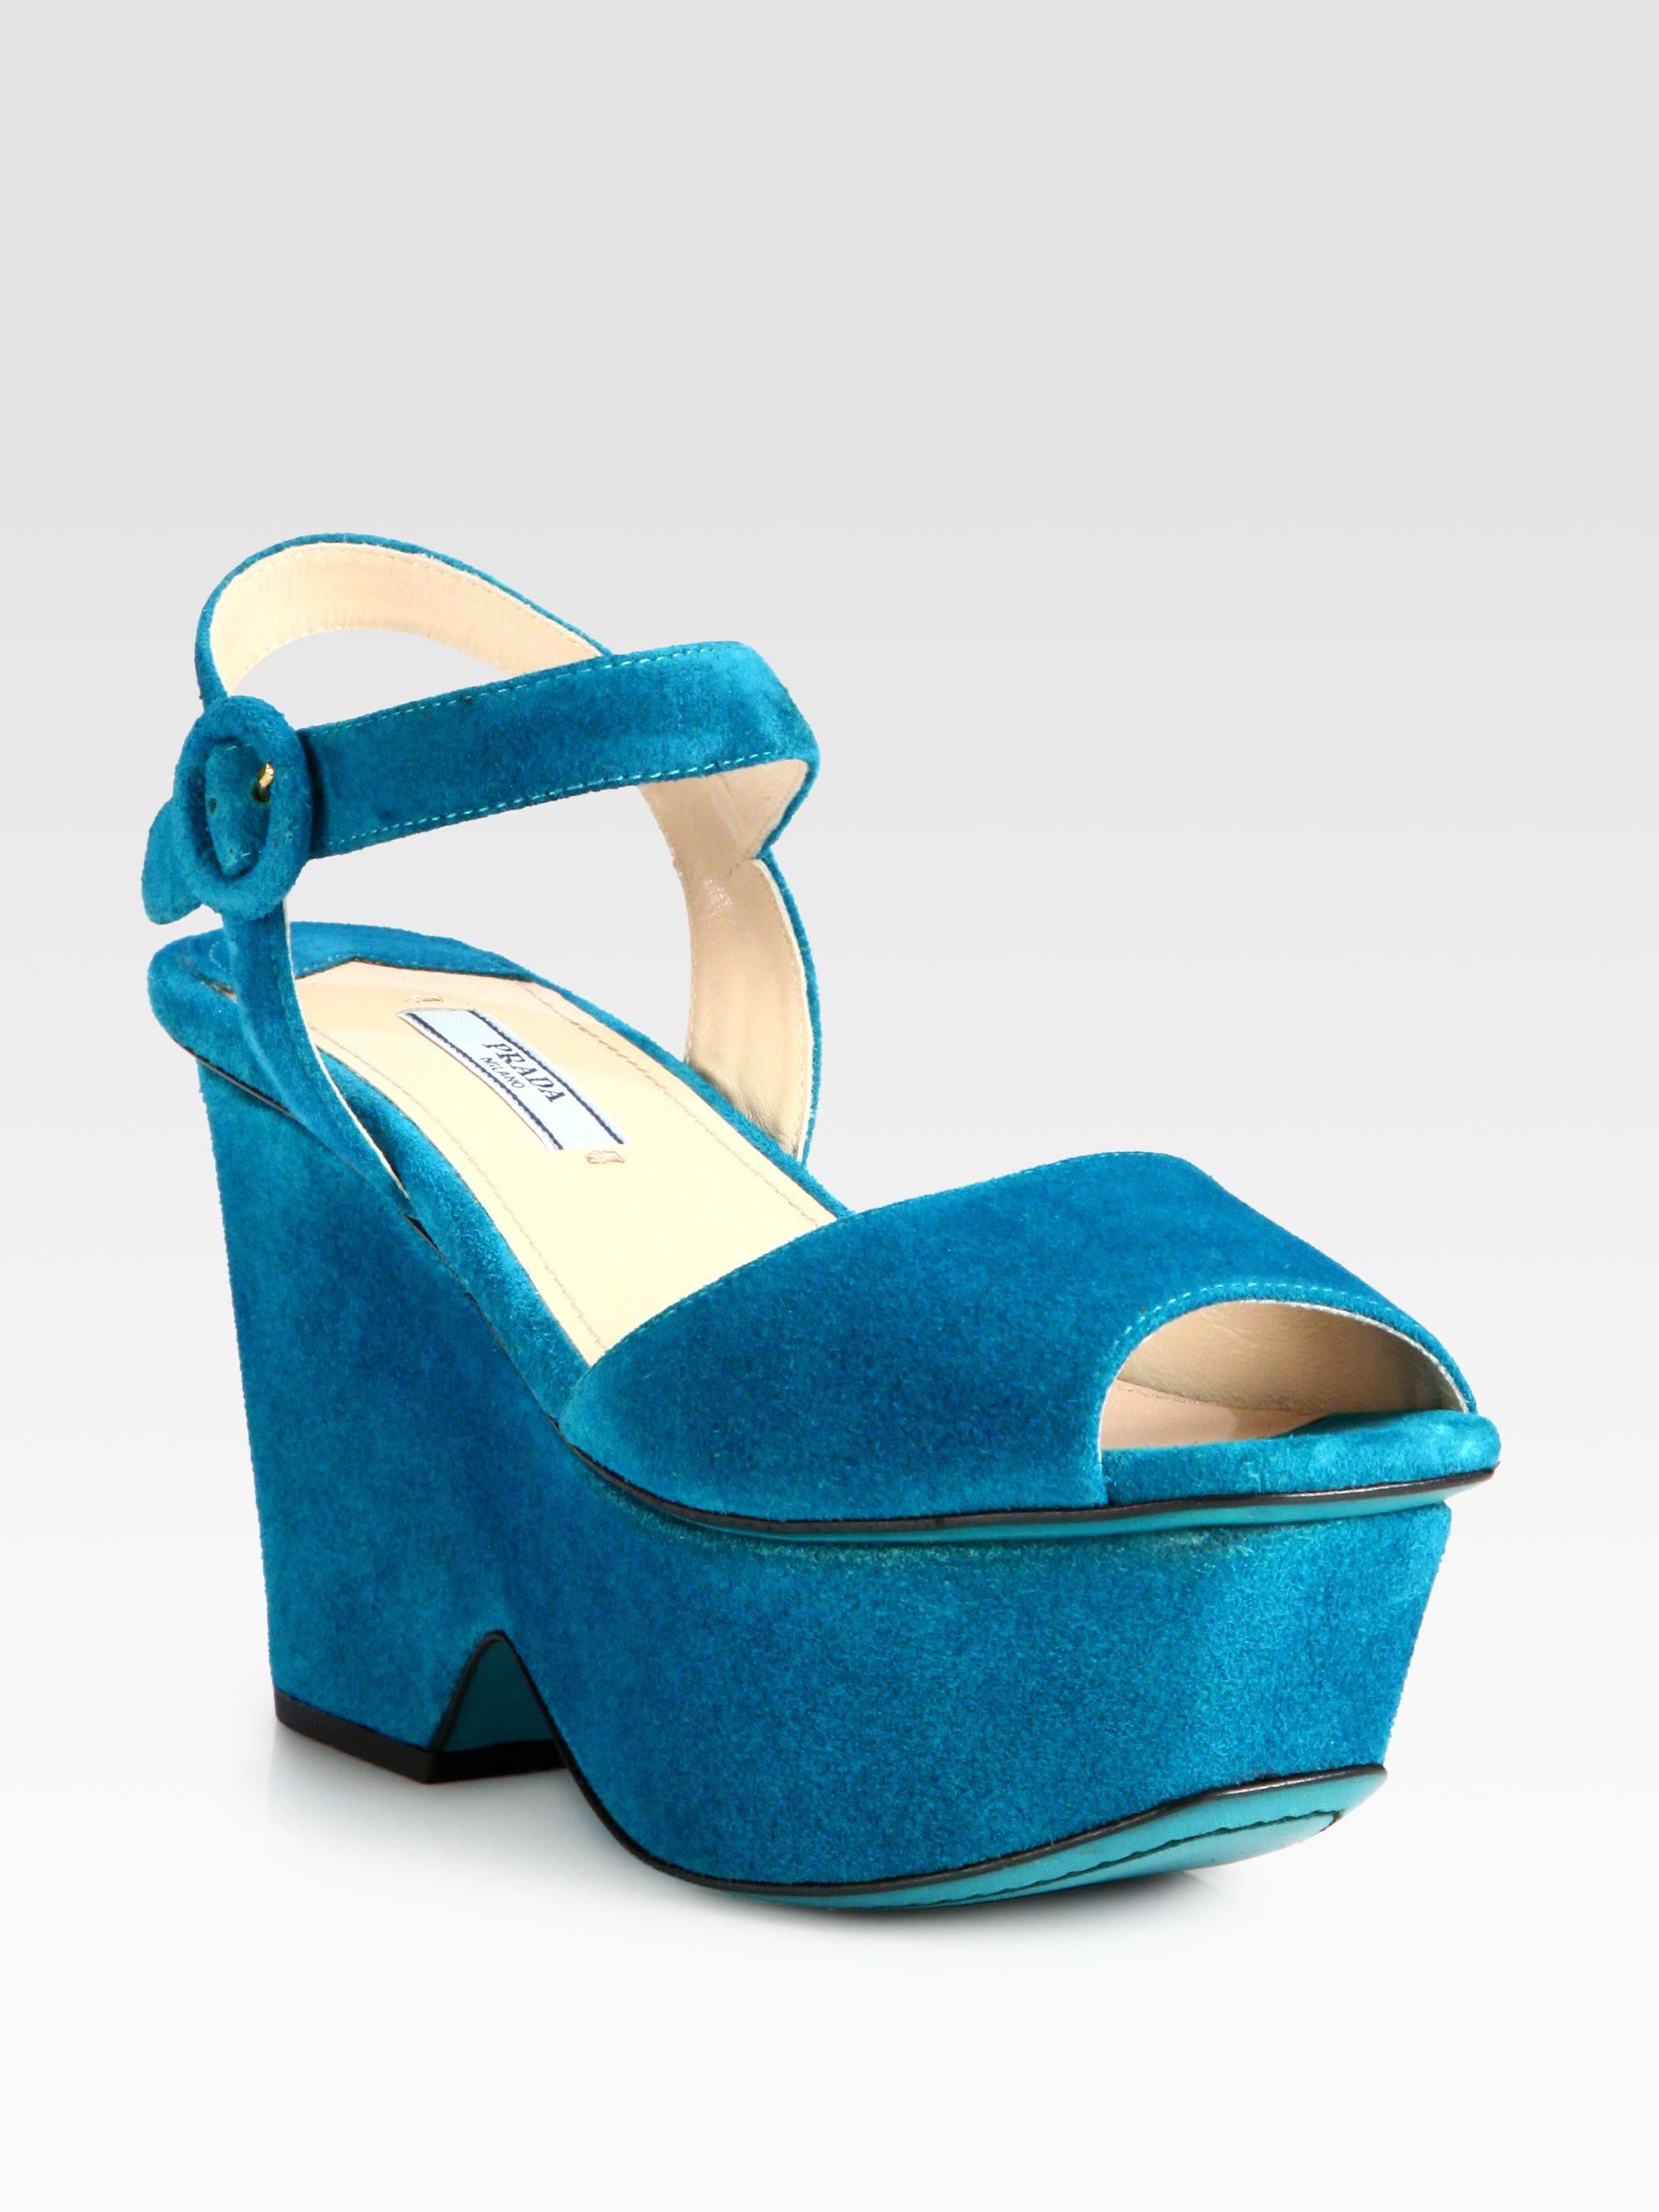 8bf1d6fe4cba Lyst - Prada Suede Platform Sandals in Blue